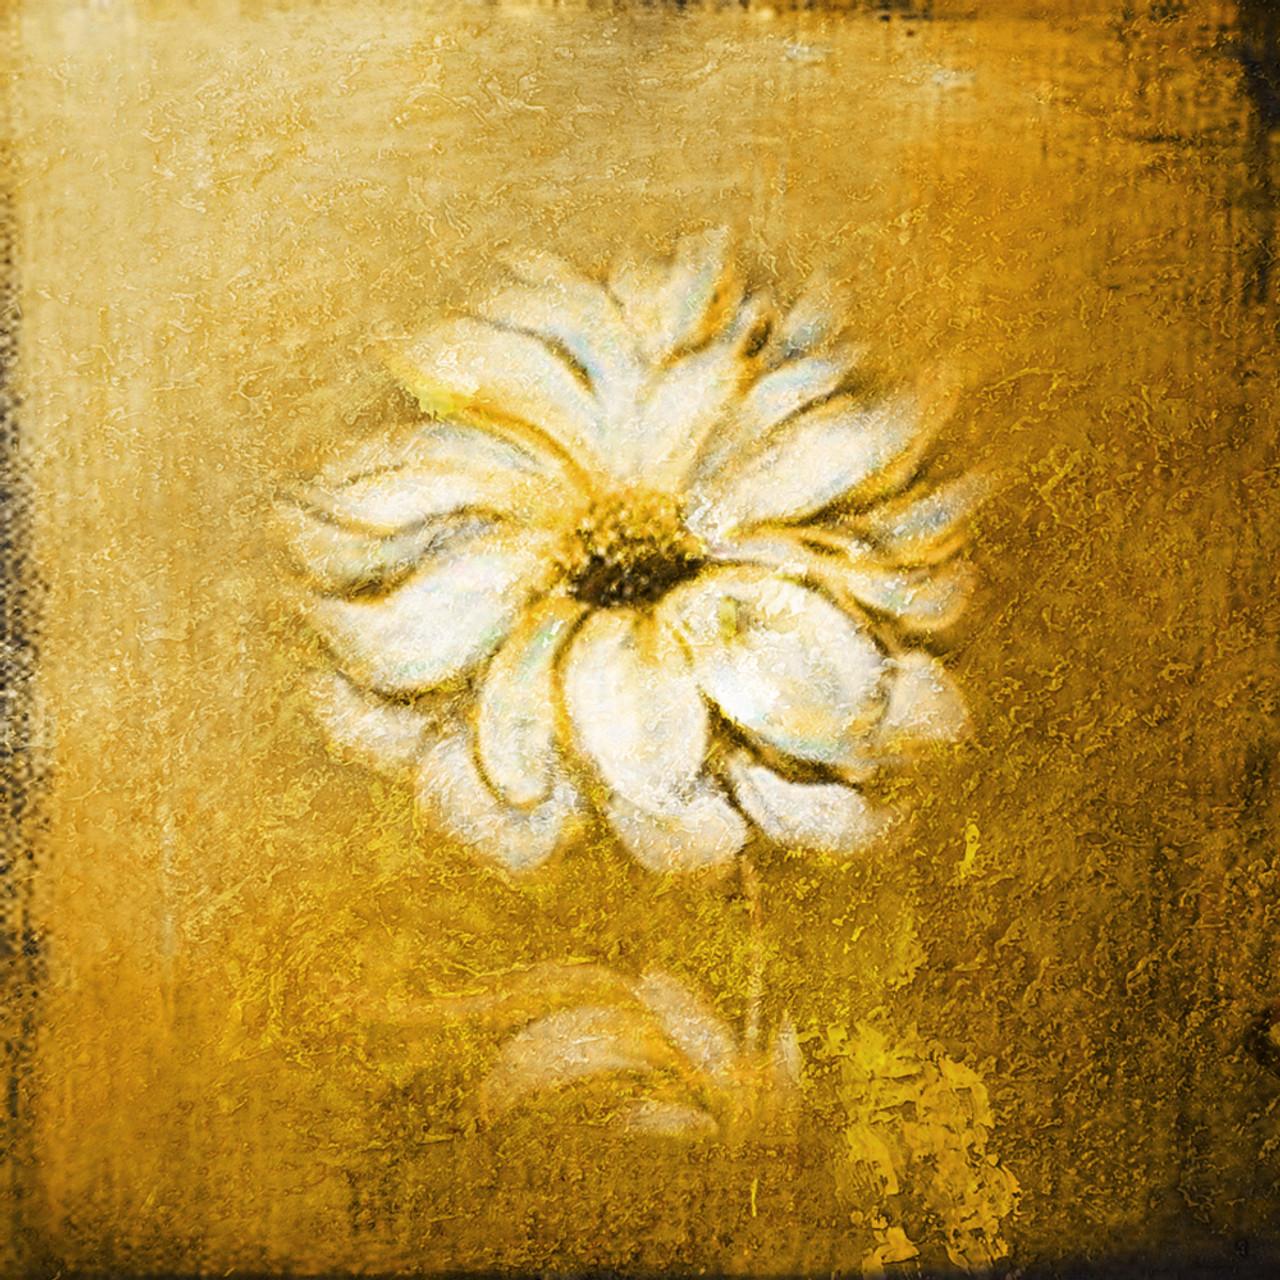 Goldie Handpainted Art Painting 24in X 24in Framed